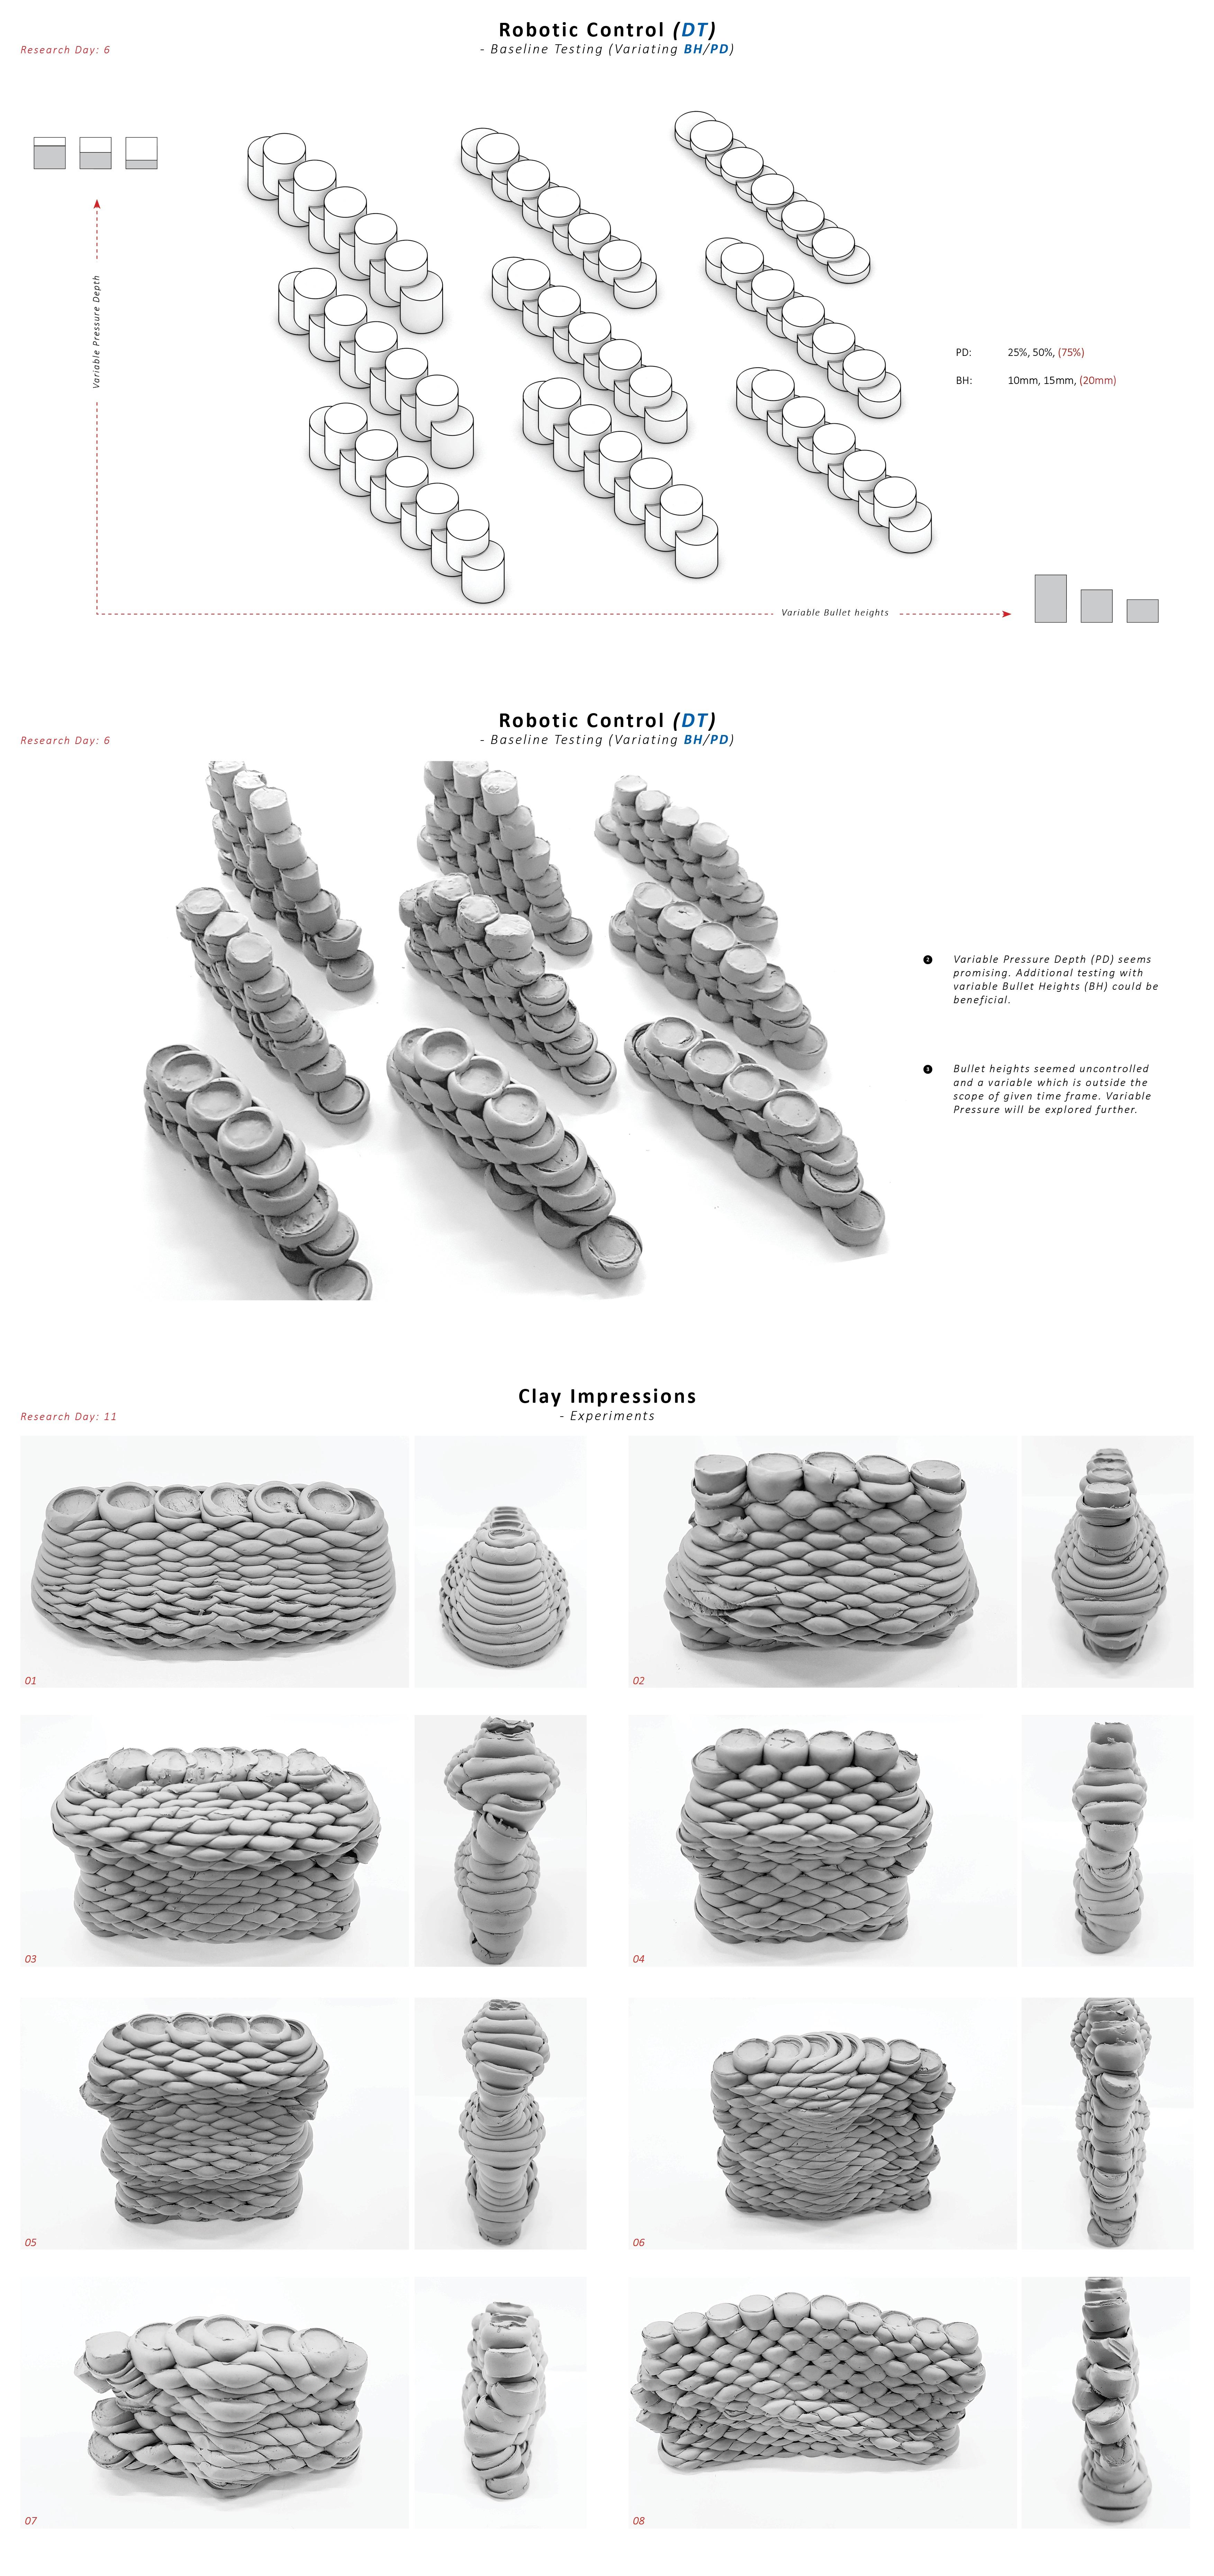 Robot Impact Printing Clay - Rahul Girish